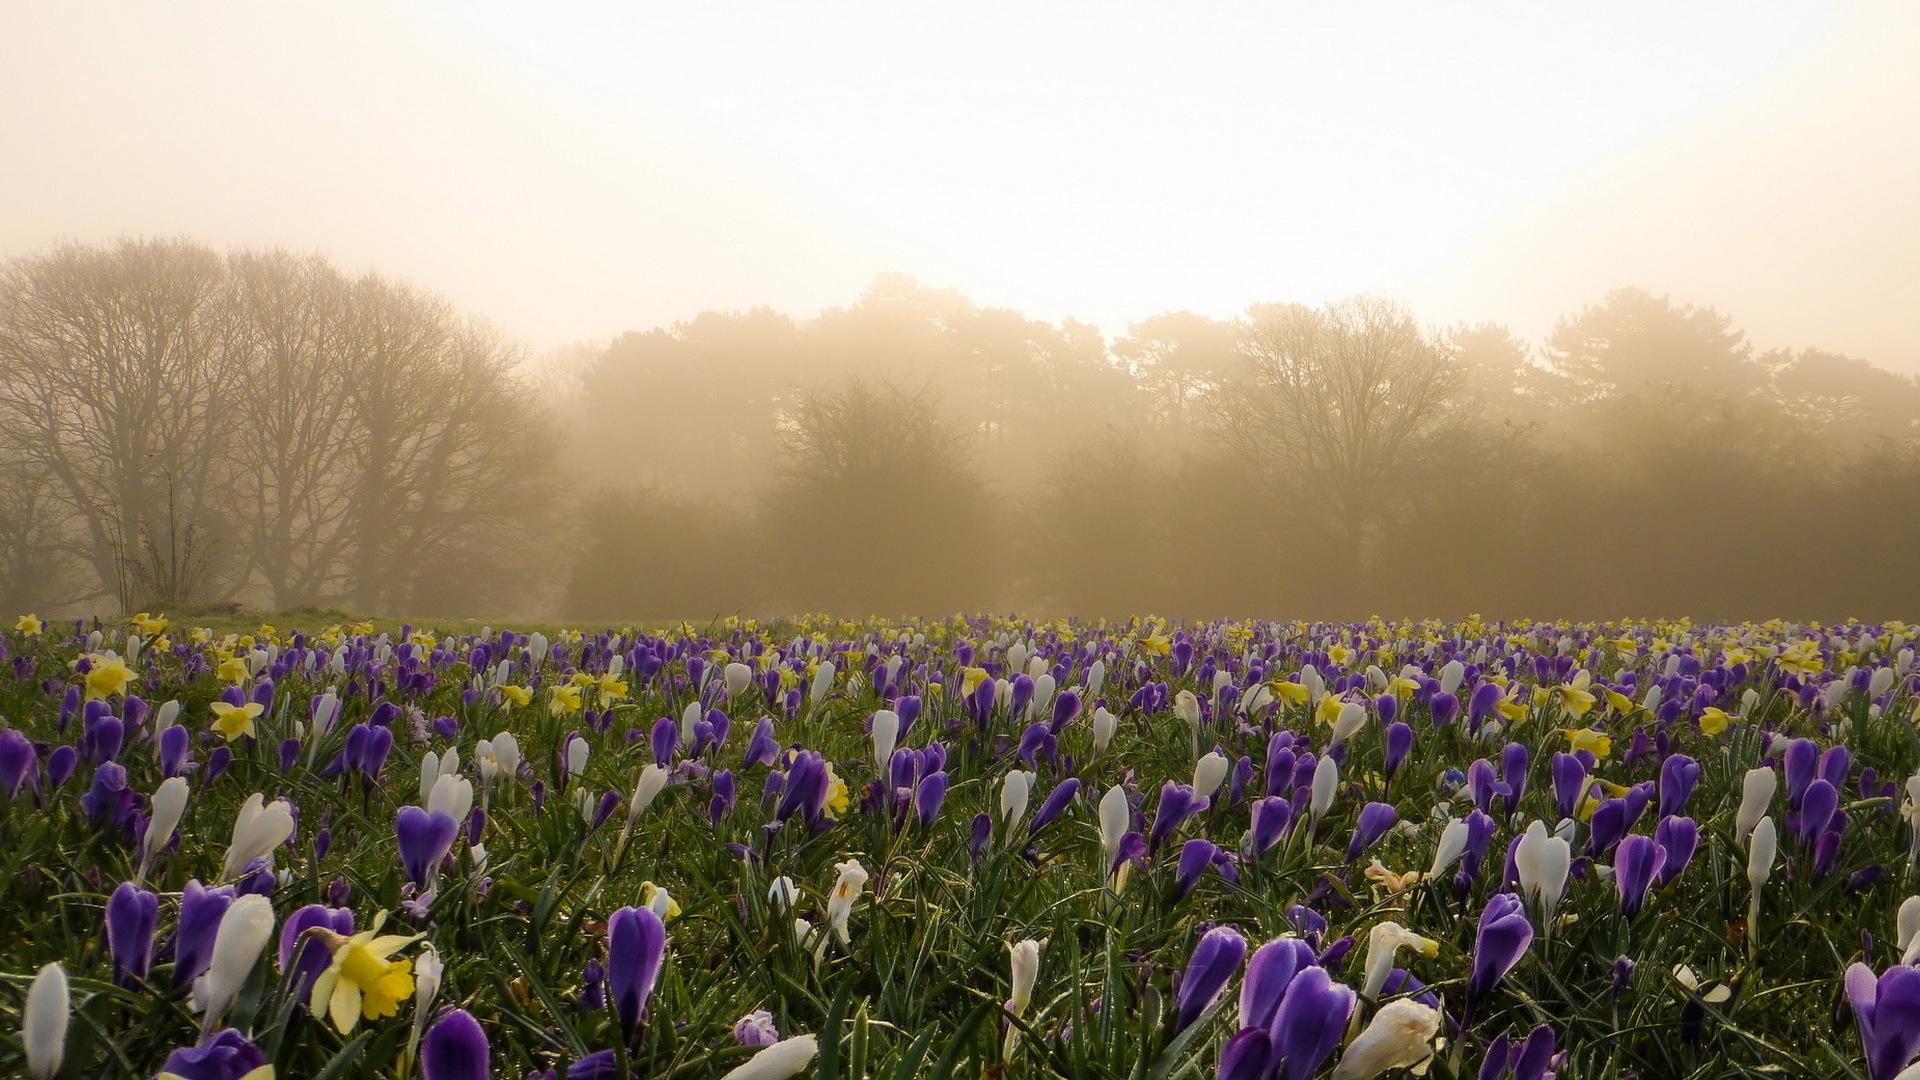 целом, картинки весна утро красота нее целый